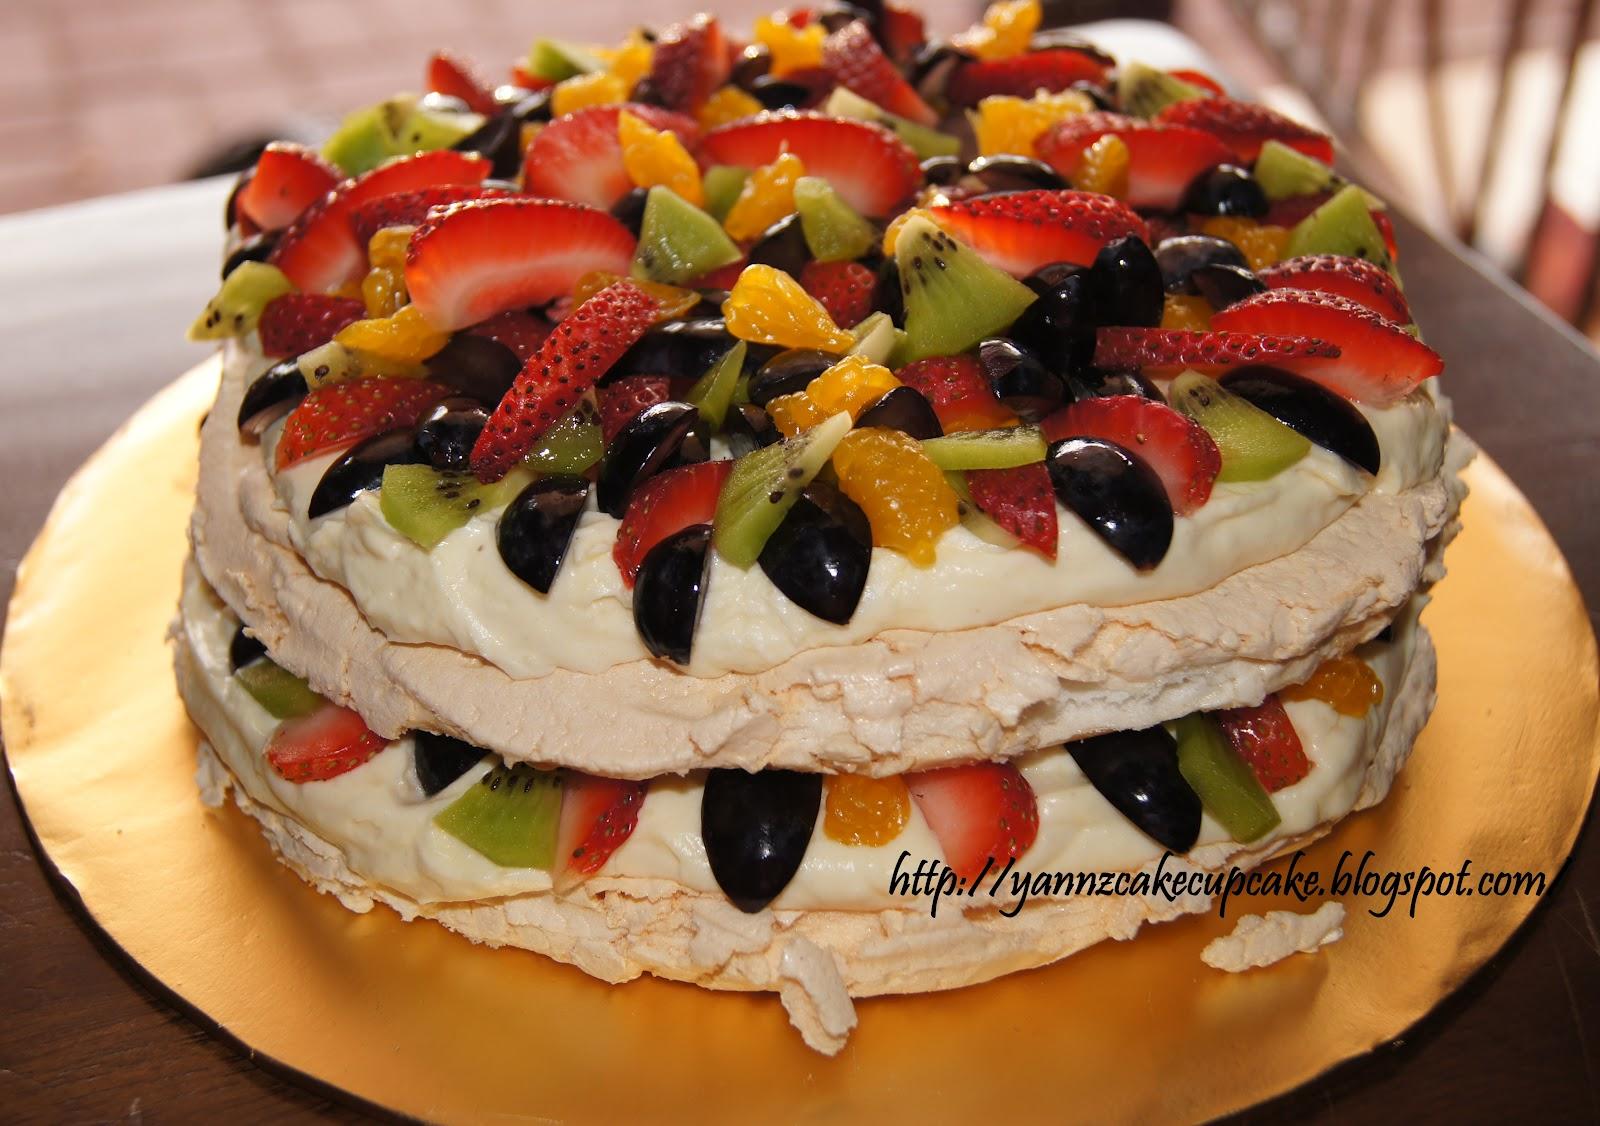 Cake & Cupcake By Yannz: Pavlova for Fadz & Haris